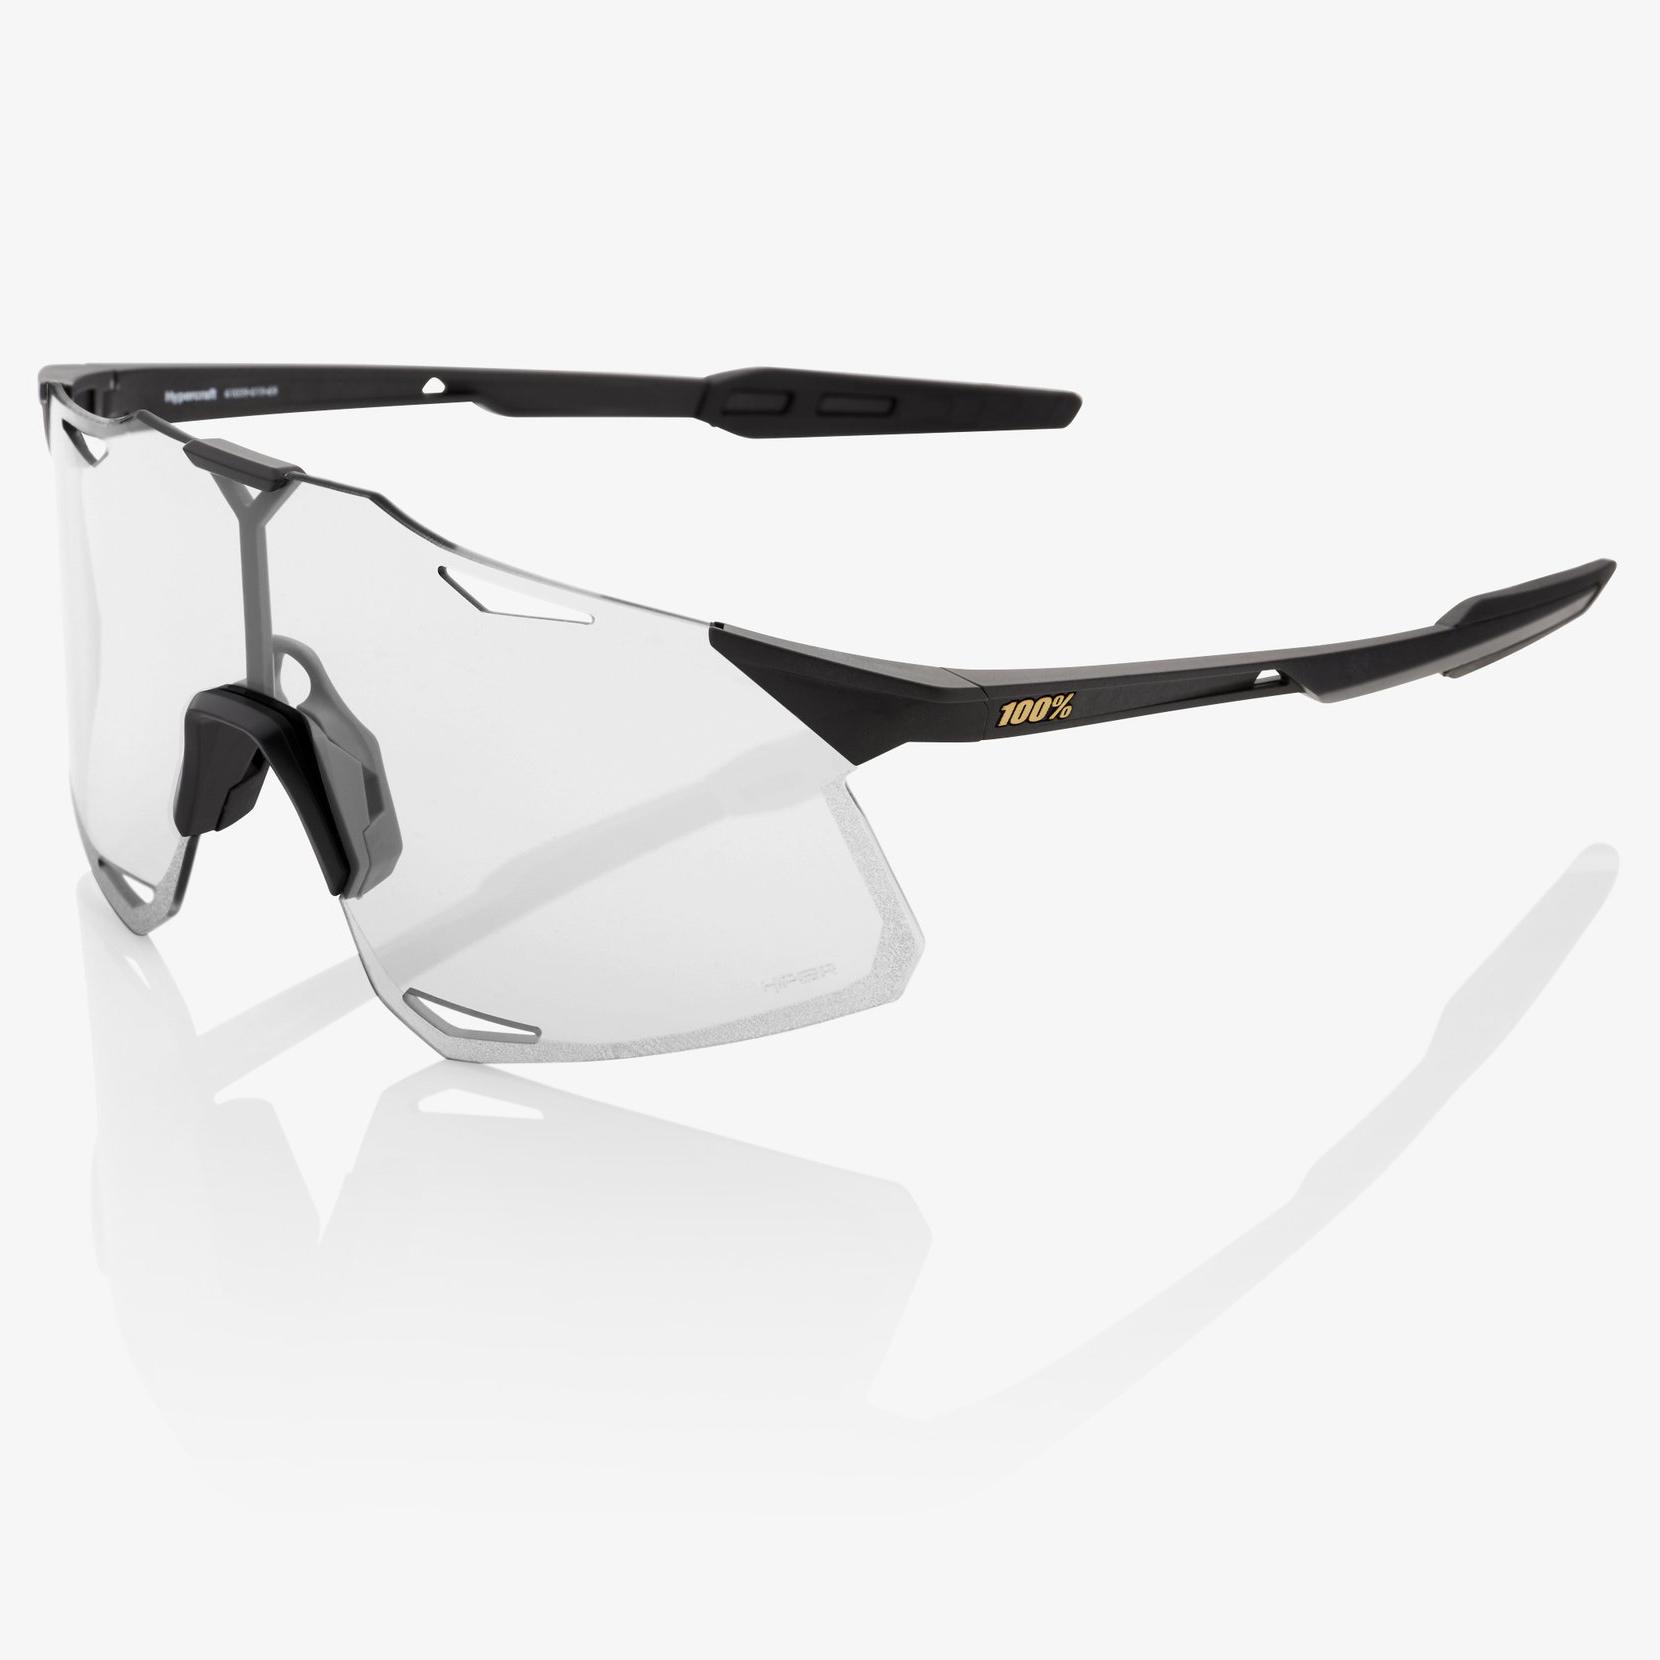 Imagen de 100% Hypercraft Mirror Lens Glasses - Matte Black/Soft Gold + Clear